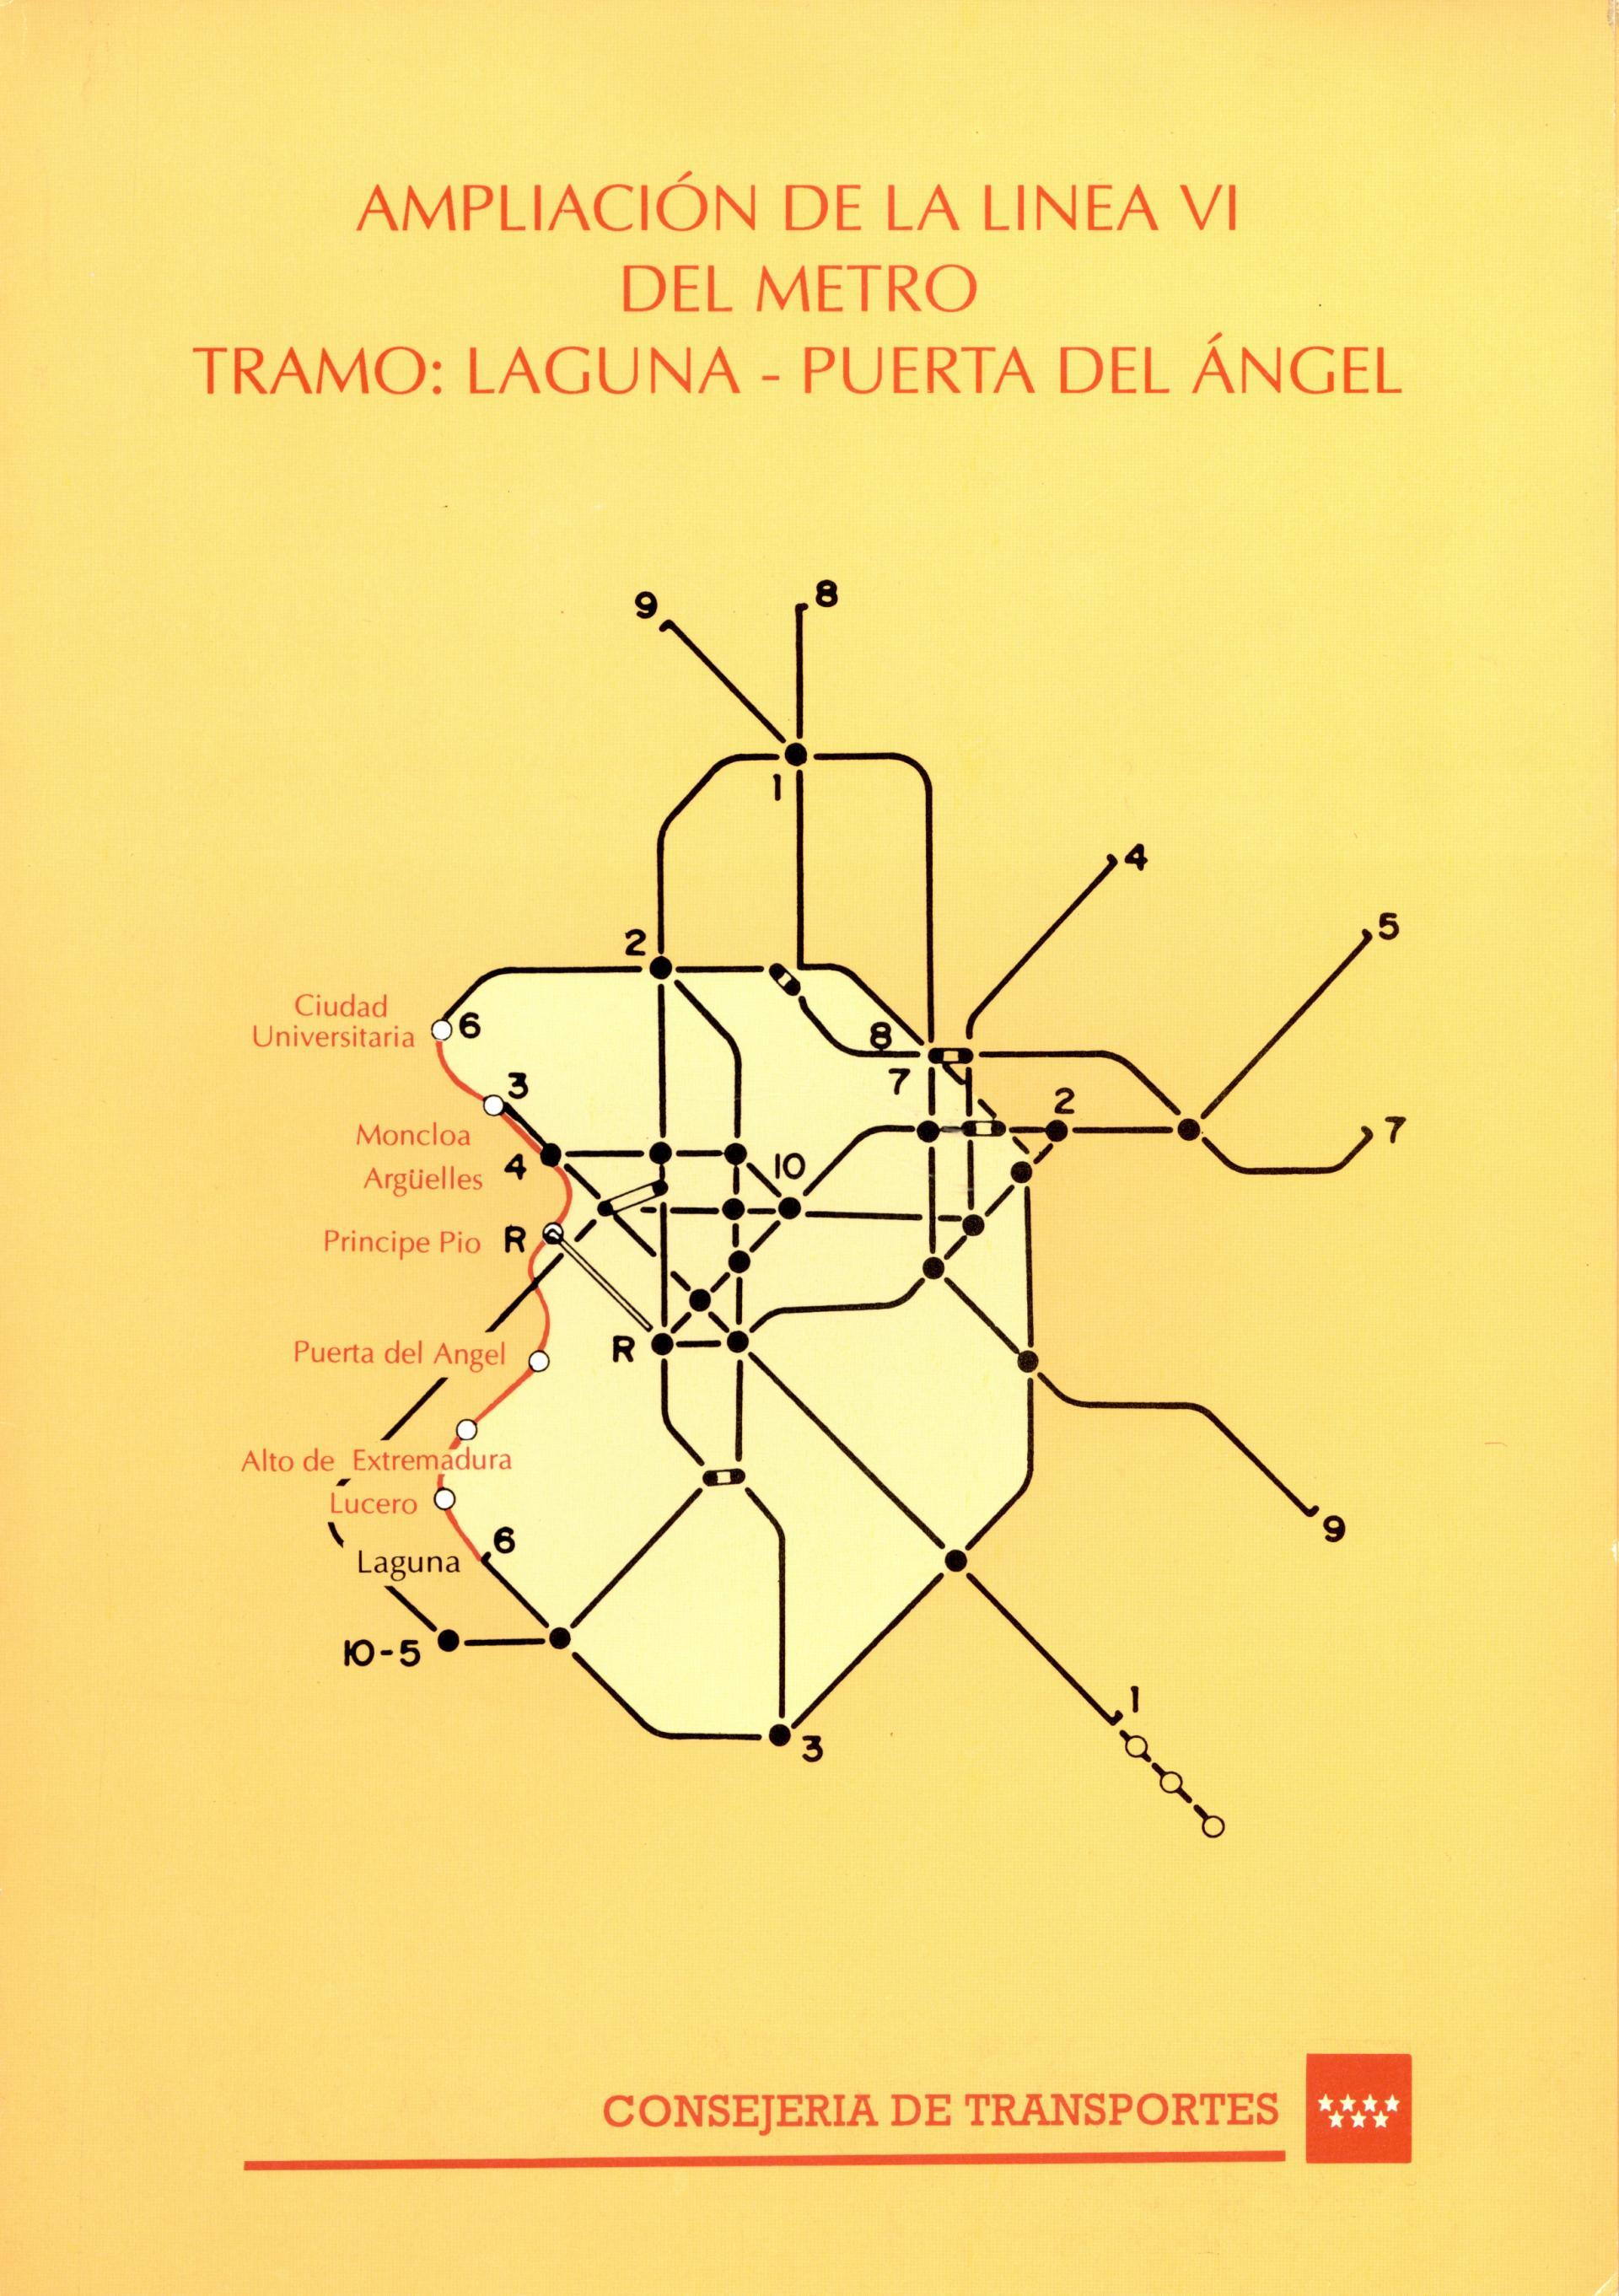 Carátula folleto L6 Laguna-Puerta del Angel